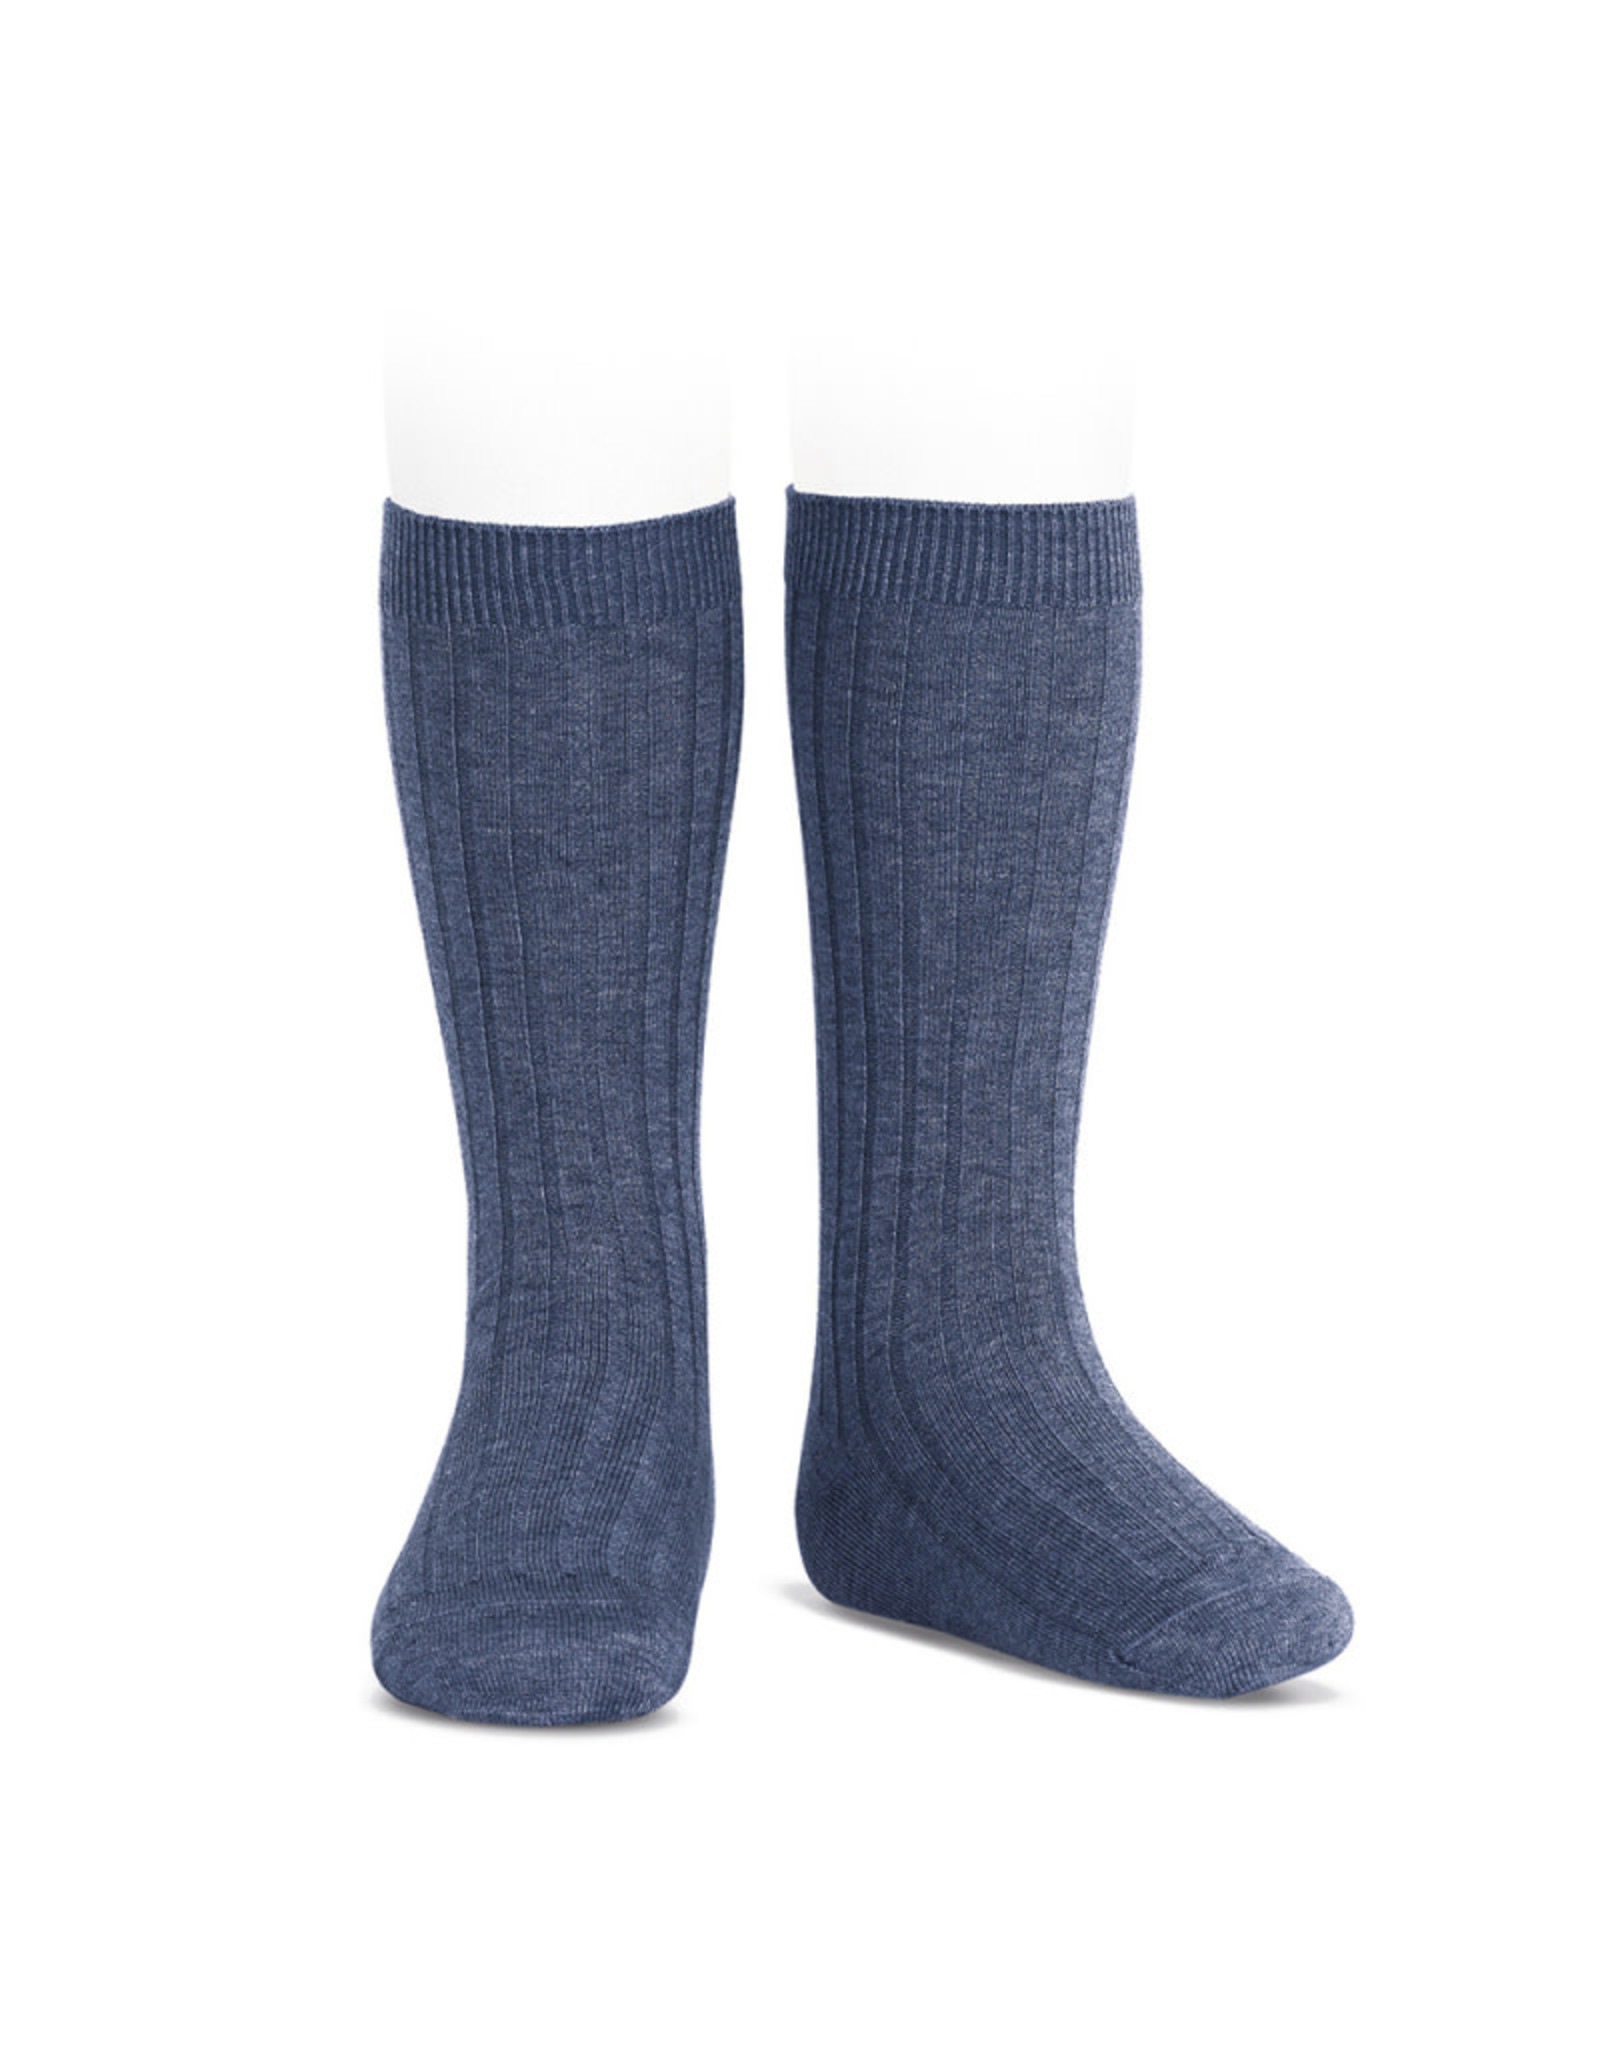 CONDOR Jeans Ribbed Knee Socks